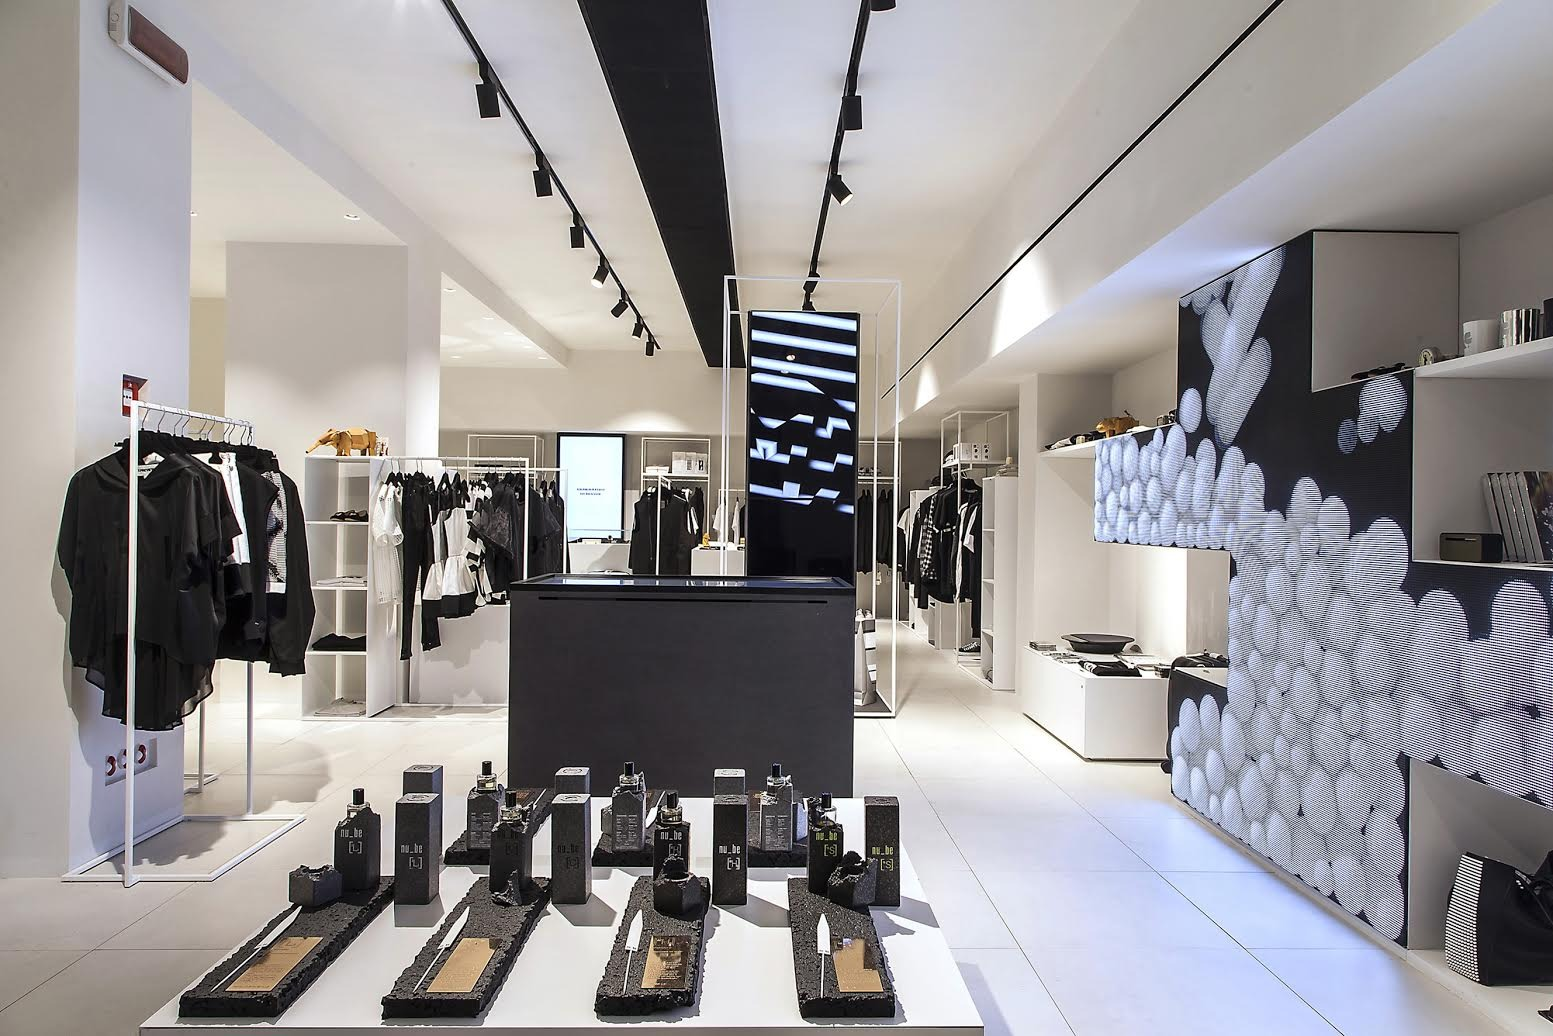 M-Collective-Store-Milano-3.jpg~original